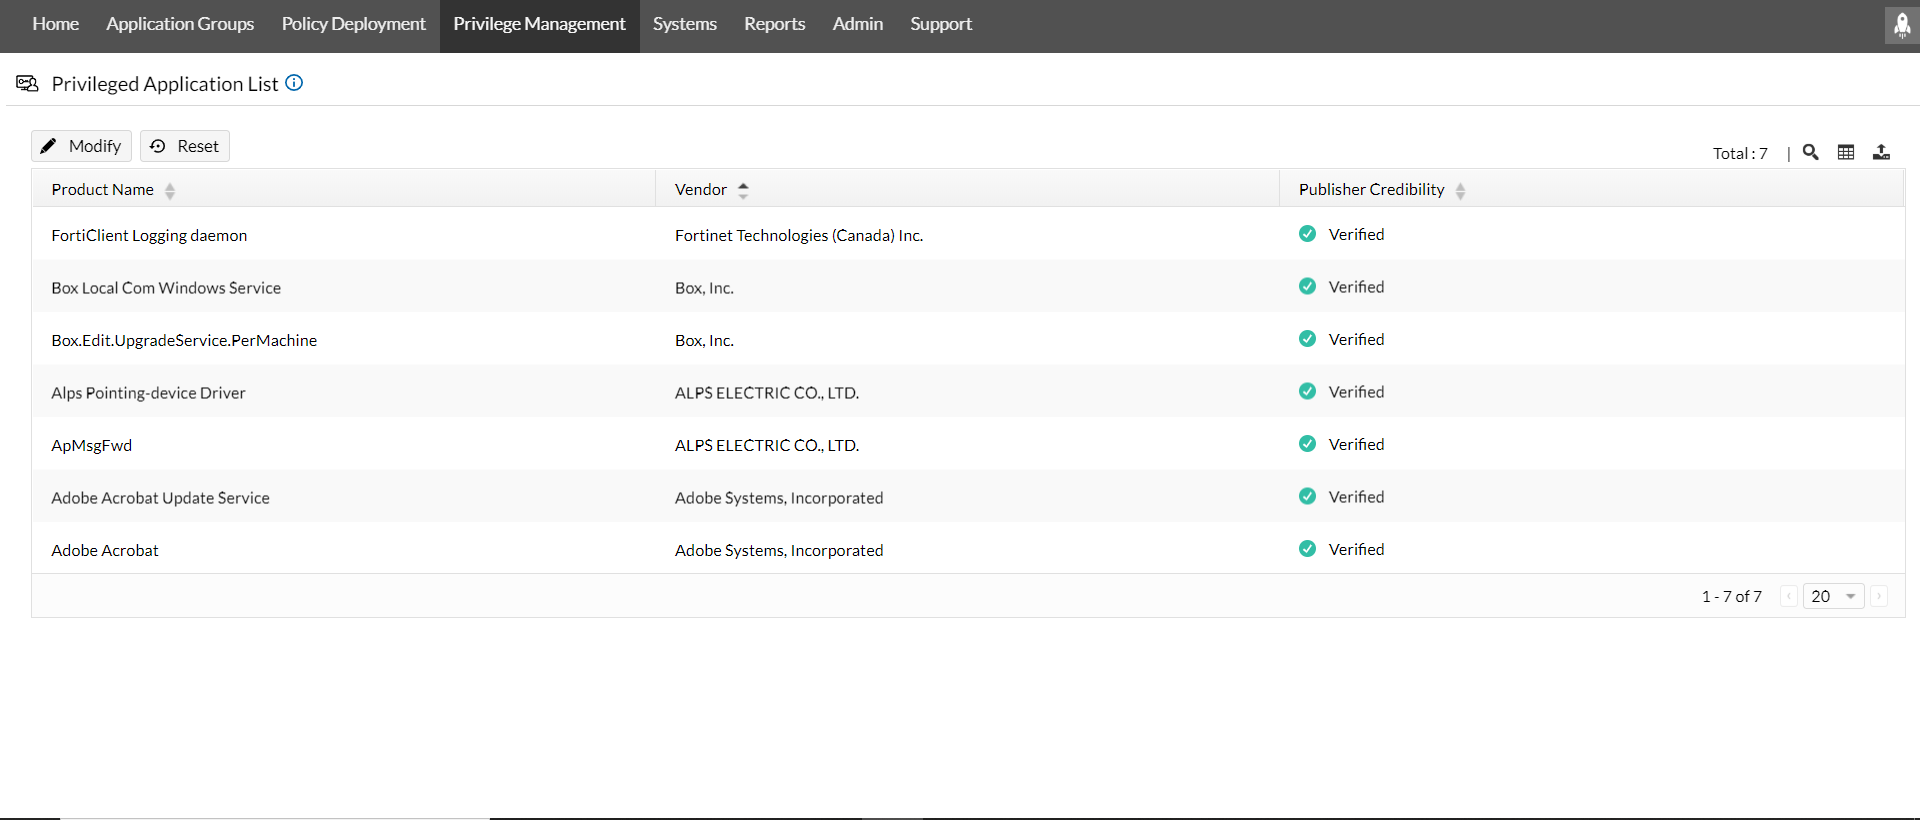 ManageEngine Application Control Plus privilege management